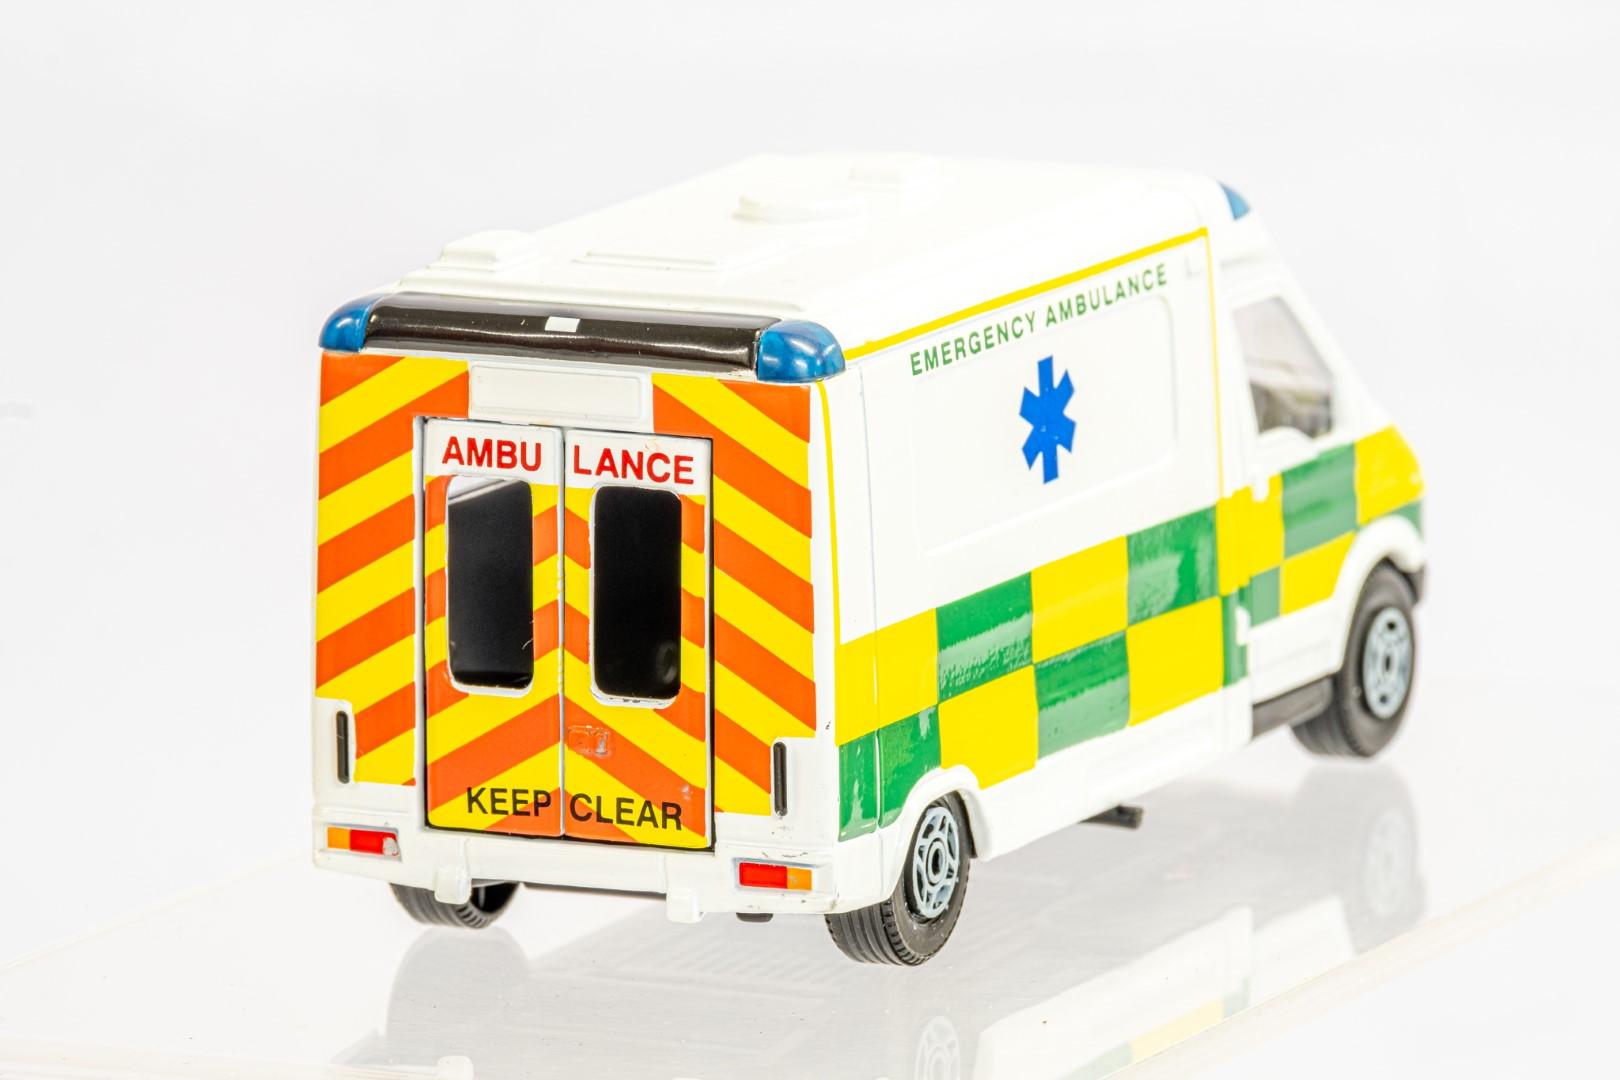 4 x Assorted Ambulance - Image 7 of 9